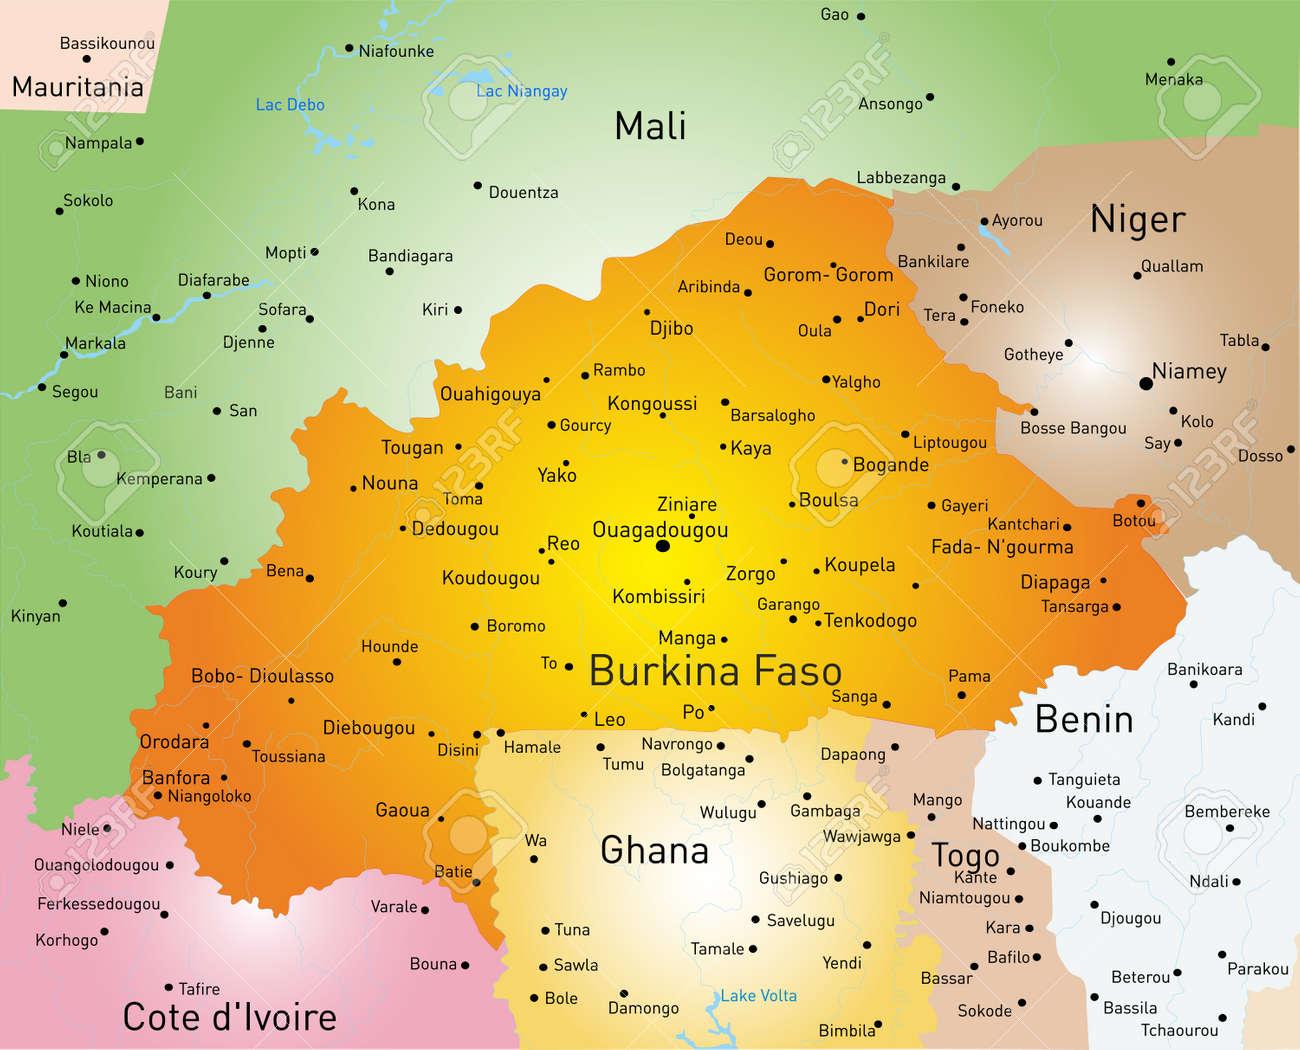 Vector Color Map Of Burkina Faso Royalty Free Cliparts Vectors And